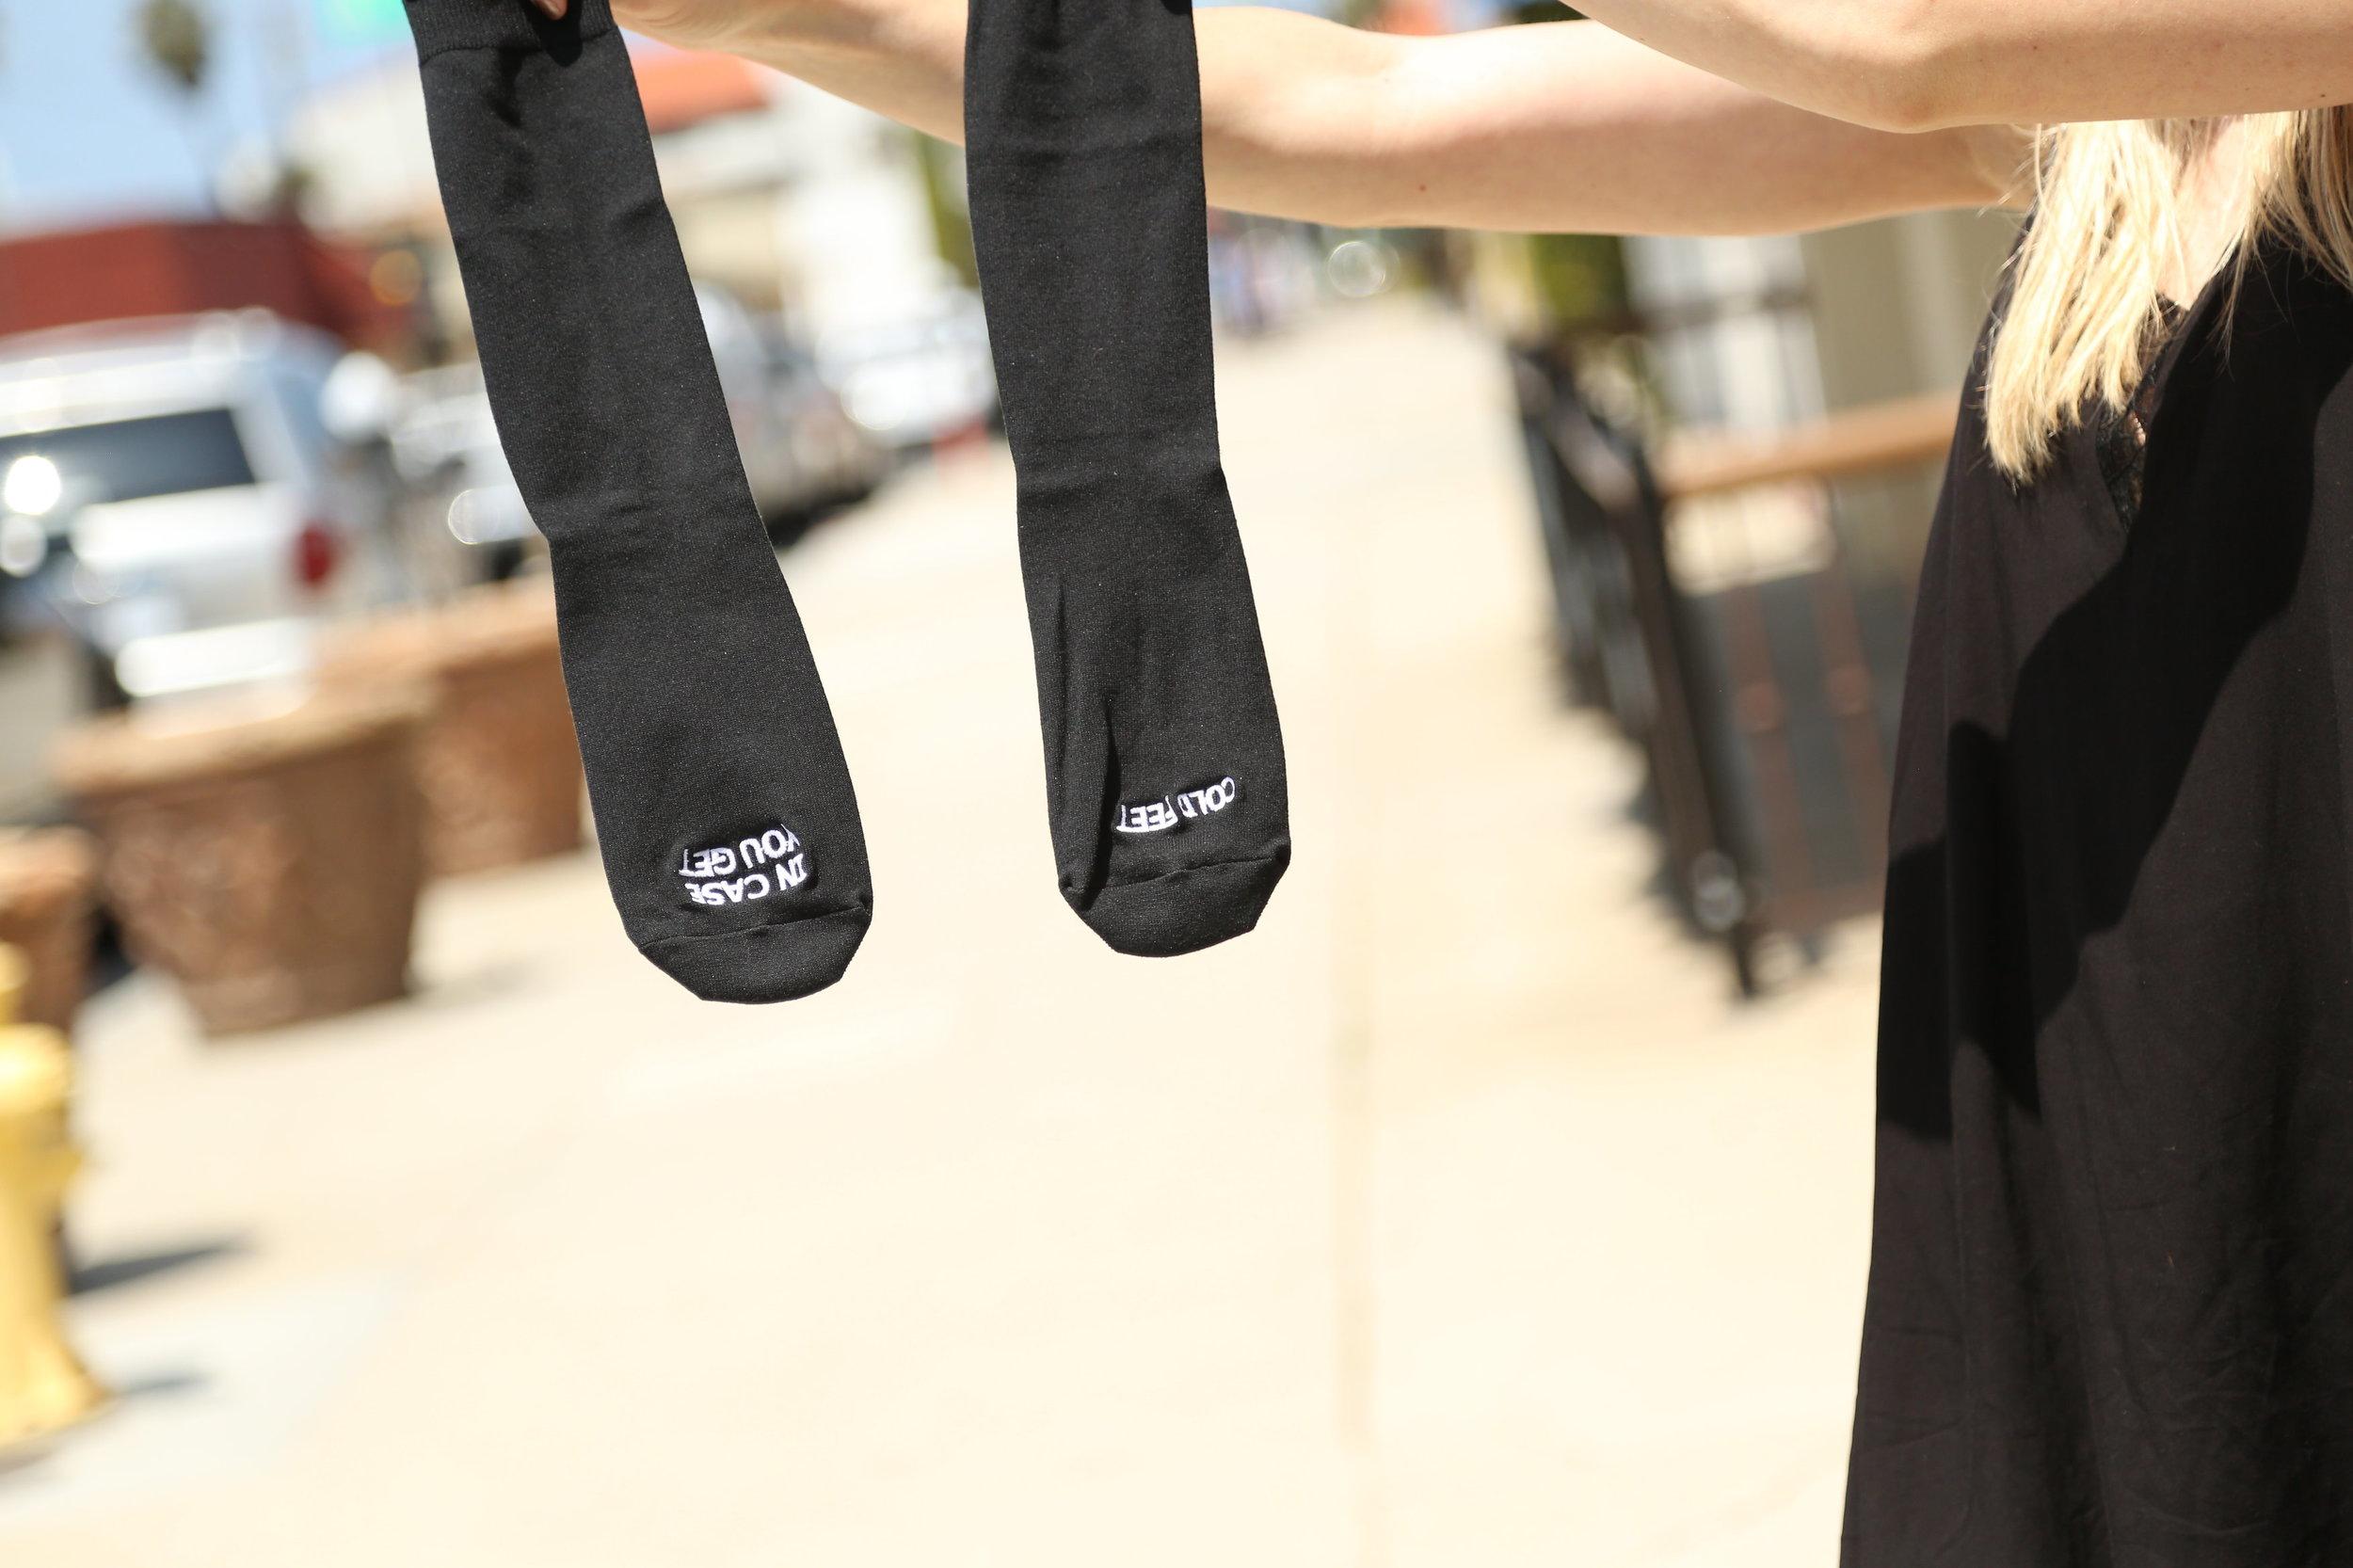 dont get cold feet groom gift socks